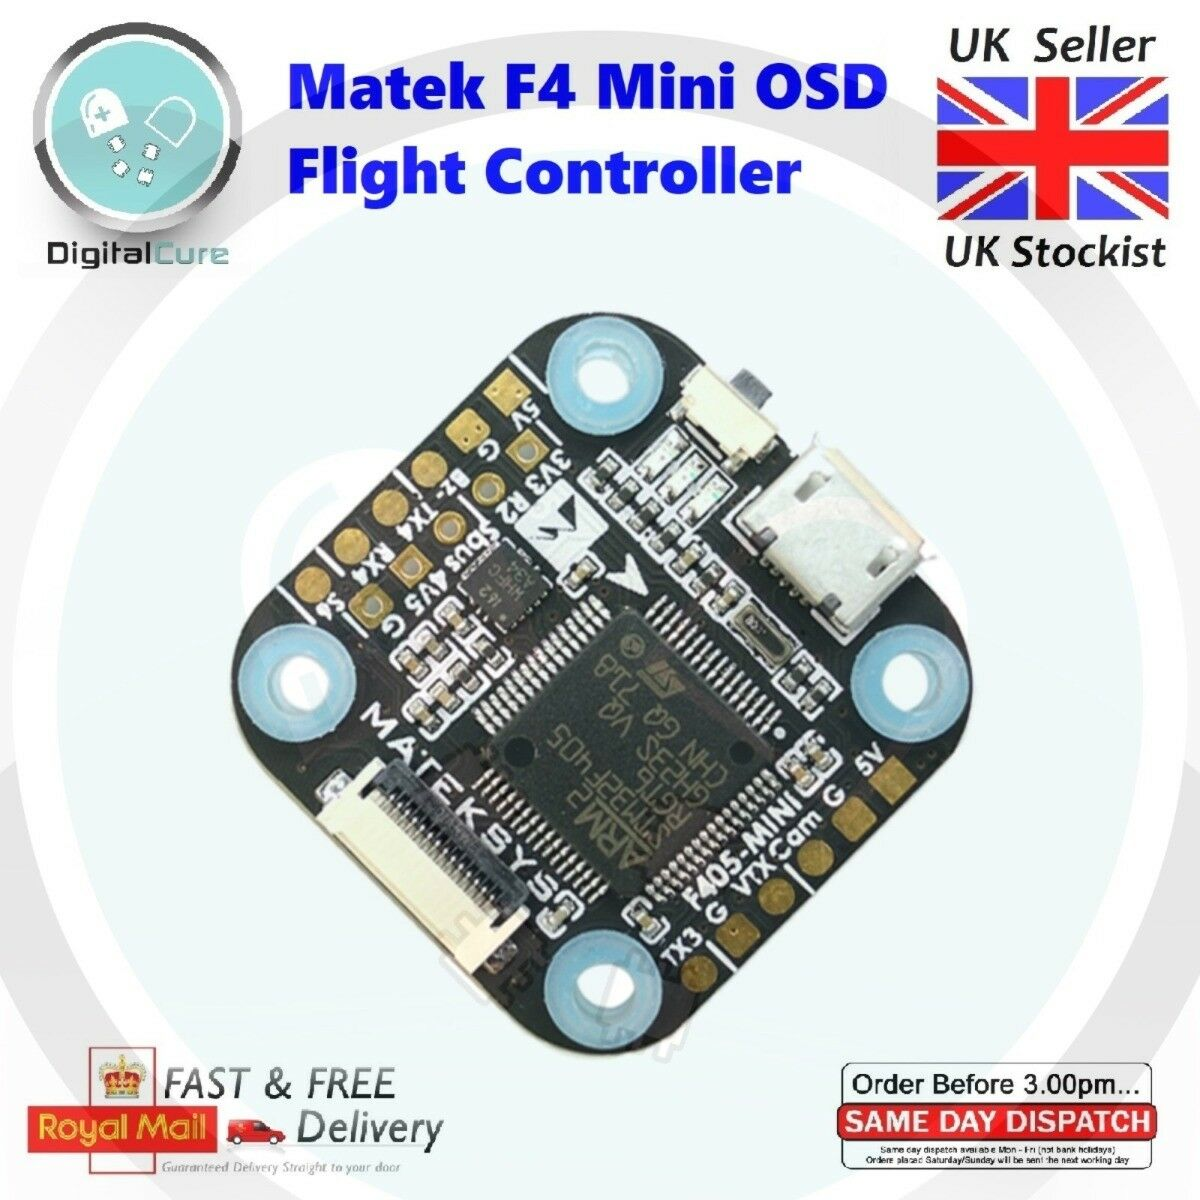 Matek F405 Mini OSD F4 Flight Controller Built-in OSD Betaflight 20mm